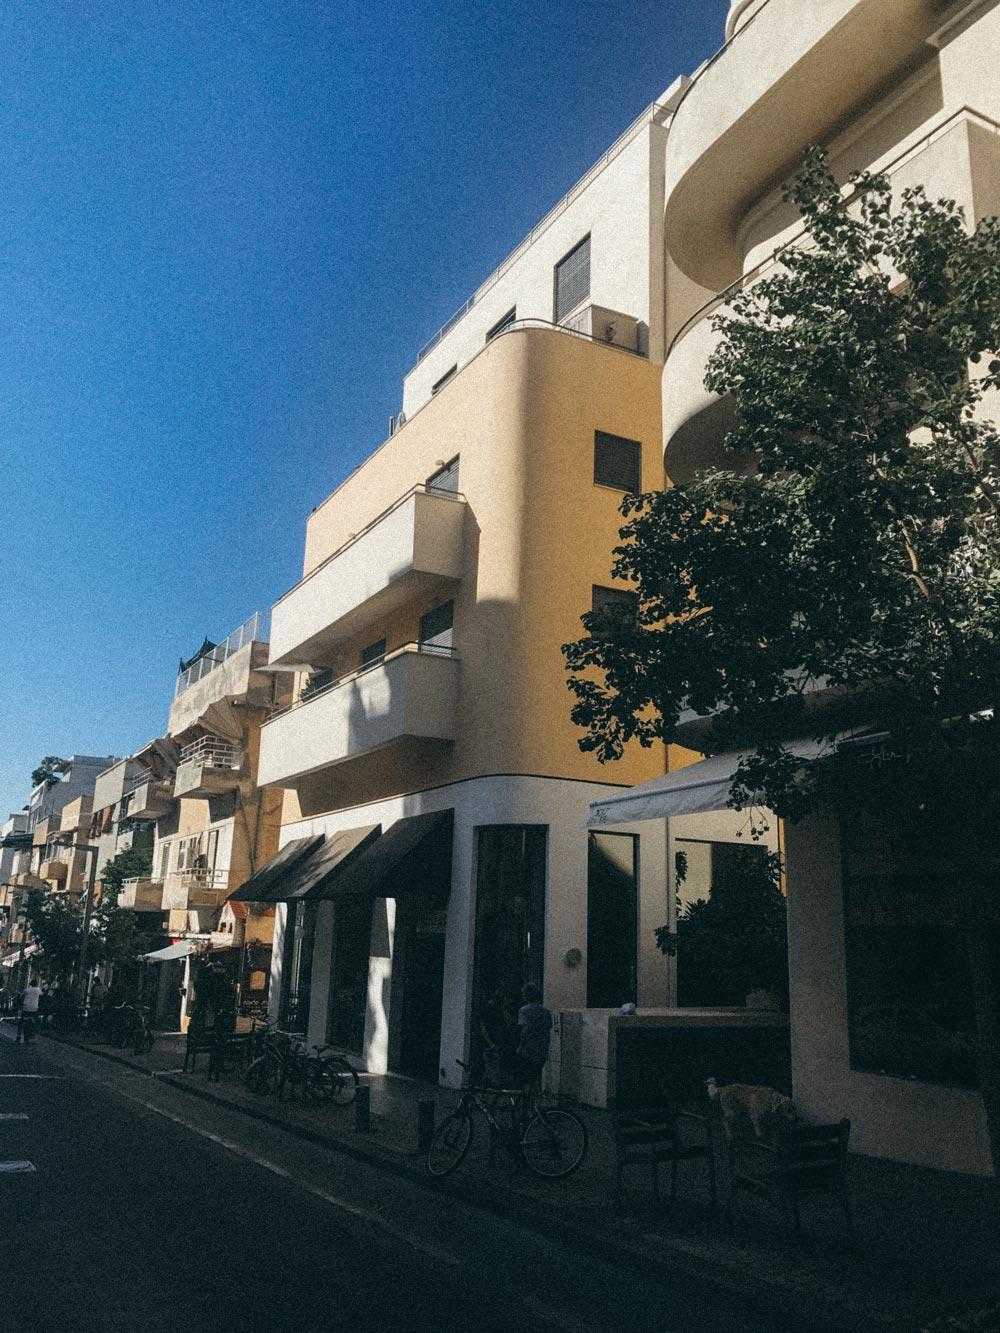 Tel Aviv Sheinkin street